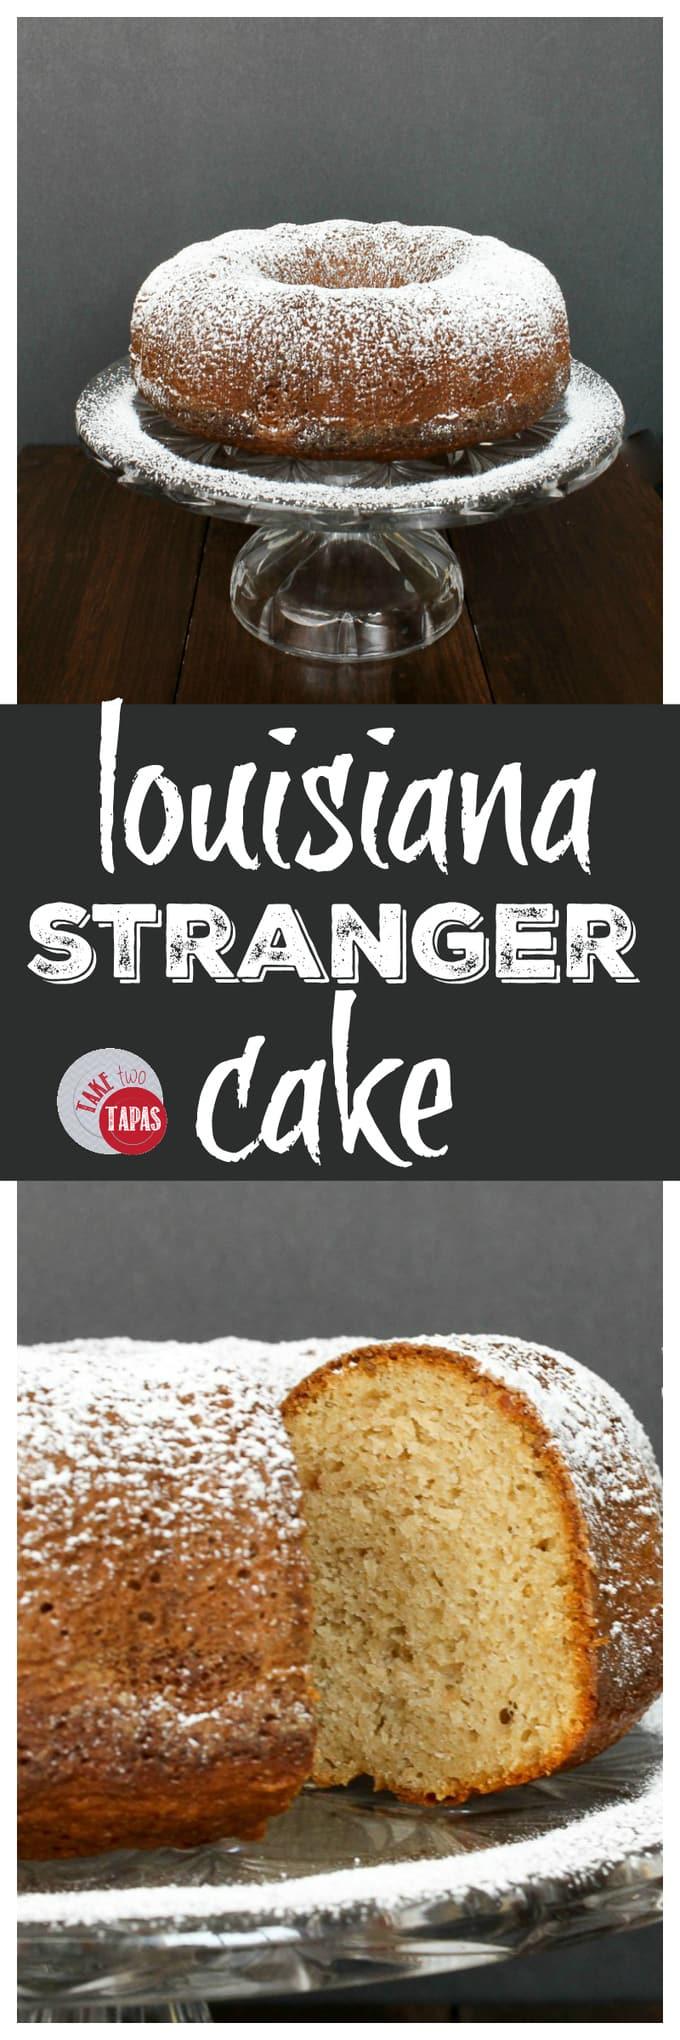 How To Make A Louisiana Stranger Cake For Freezing!